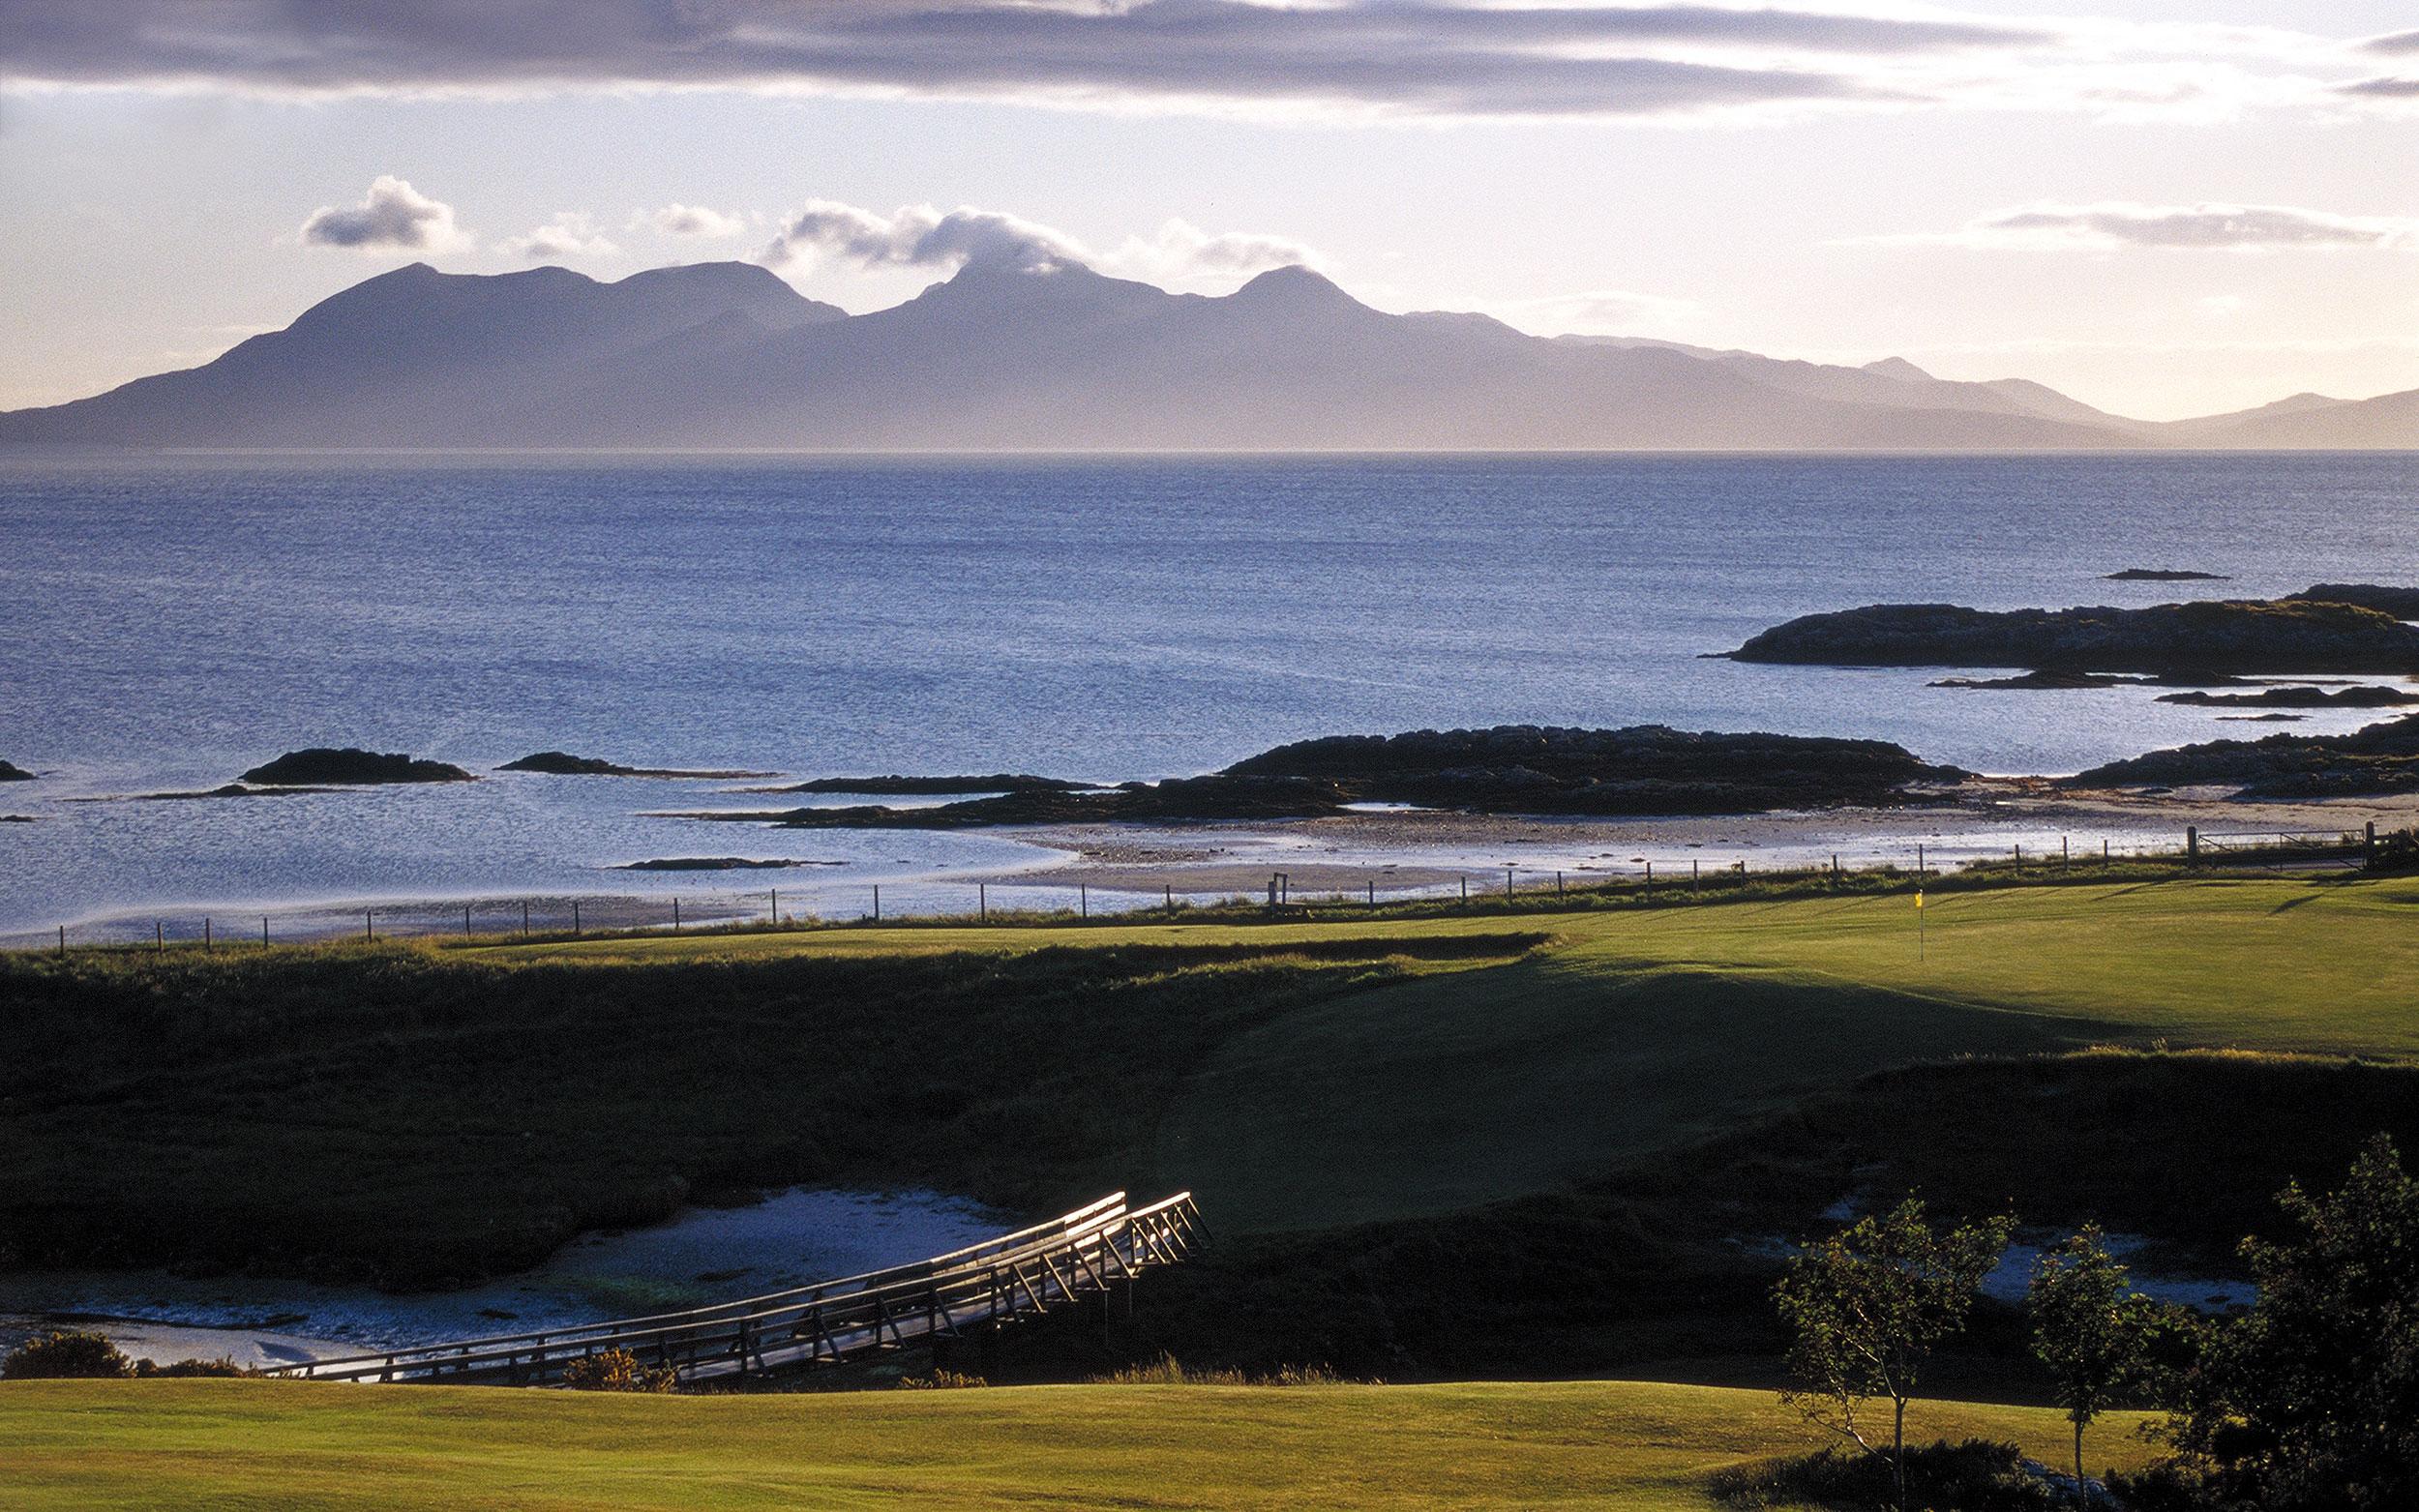 tim-booth-blue-sunset-pc-standard_w2500.jpg